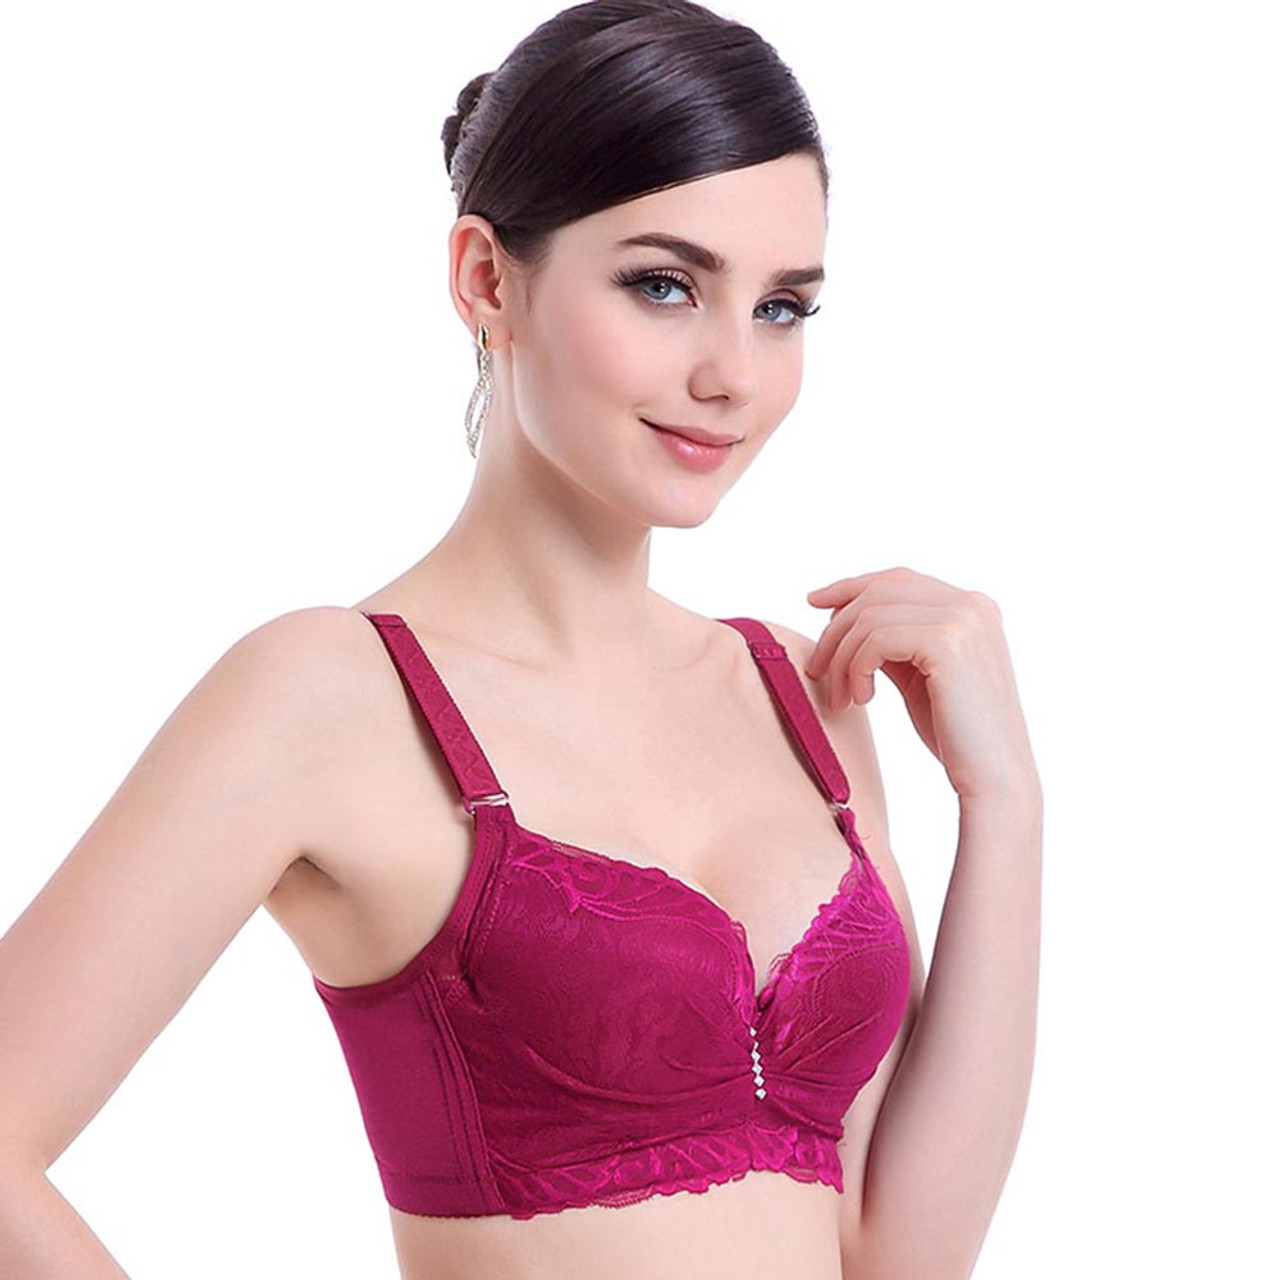 d7687278ea8 ... Women Bra Push Up Sexy Lace Brassier Lntimates Ladies Big Size Bra  Underwear Embroidery Cotton Plus ...